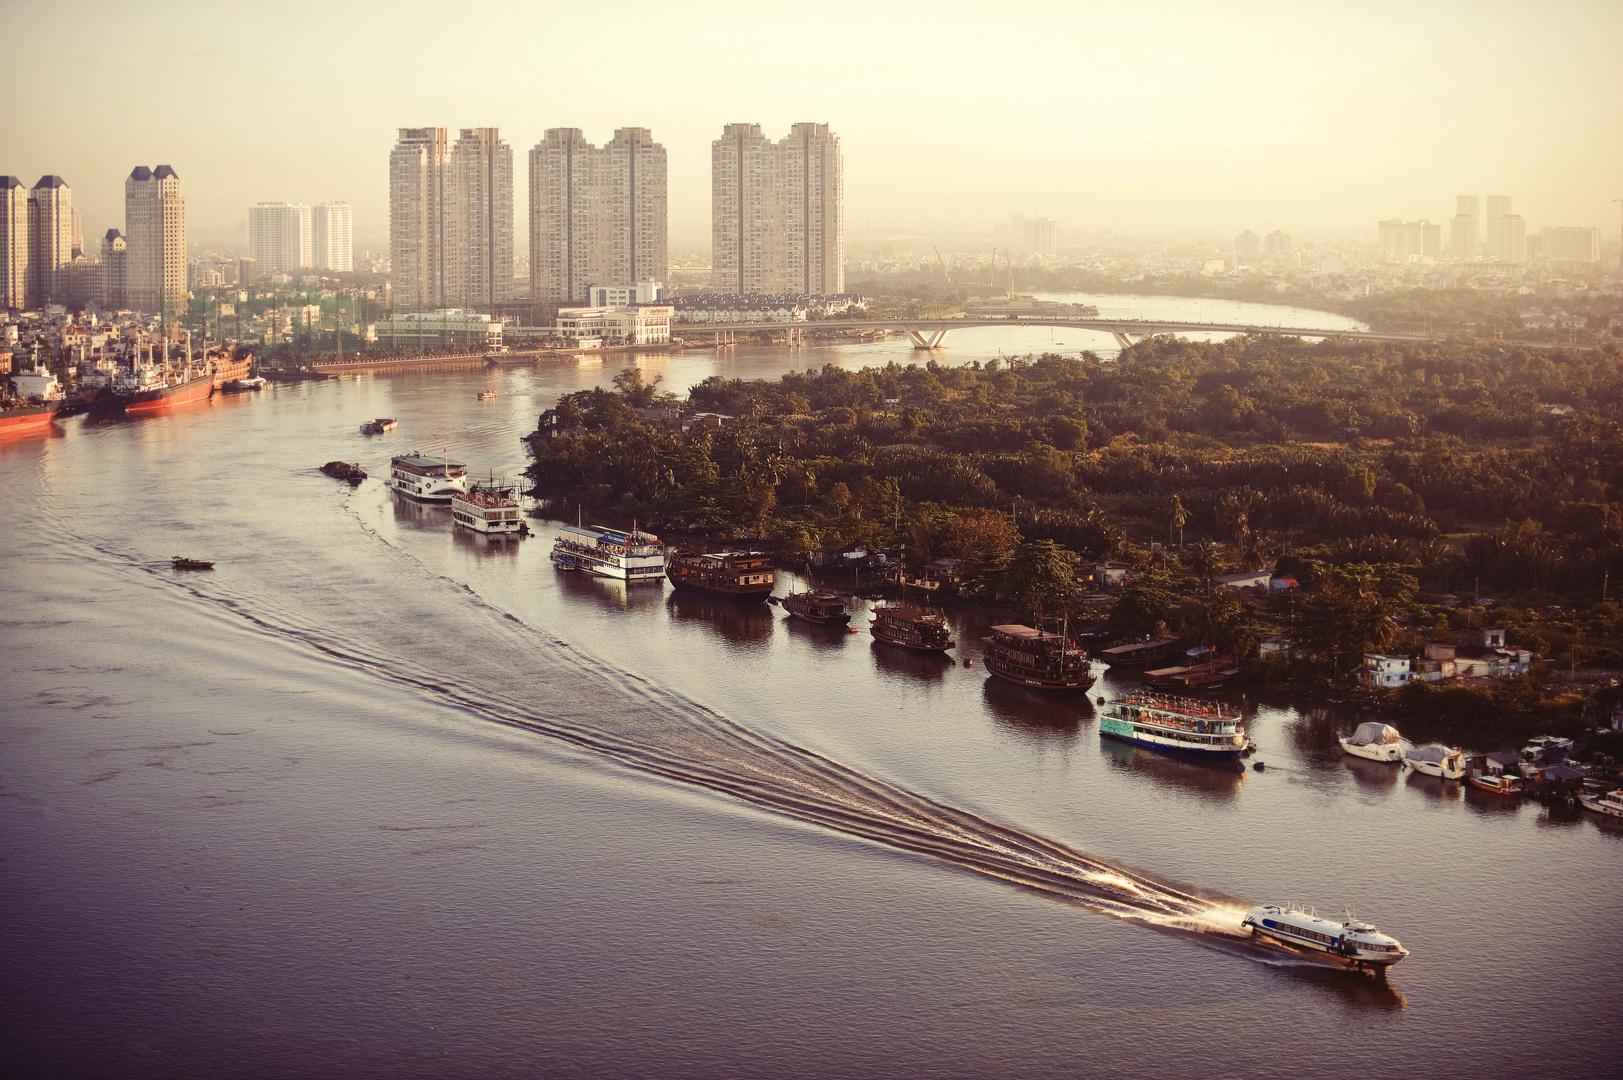 Mekong, Ho Chi Minh City, Vietnam